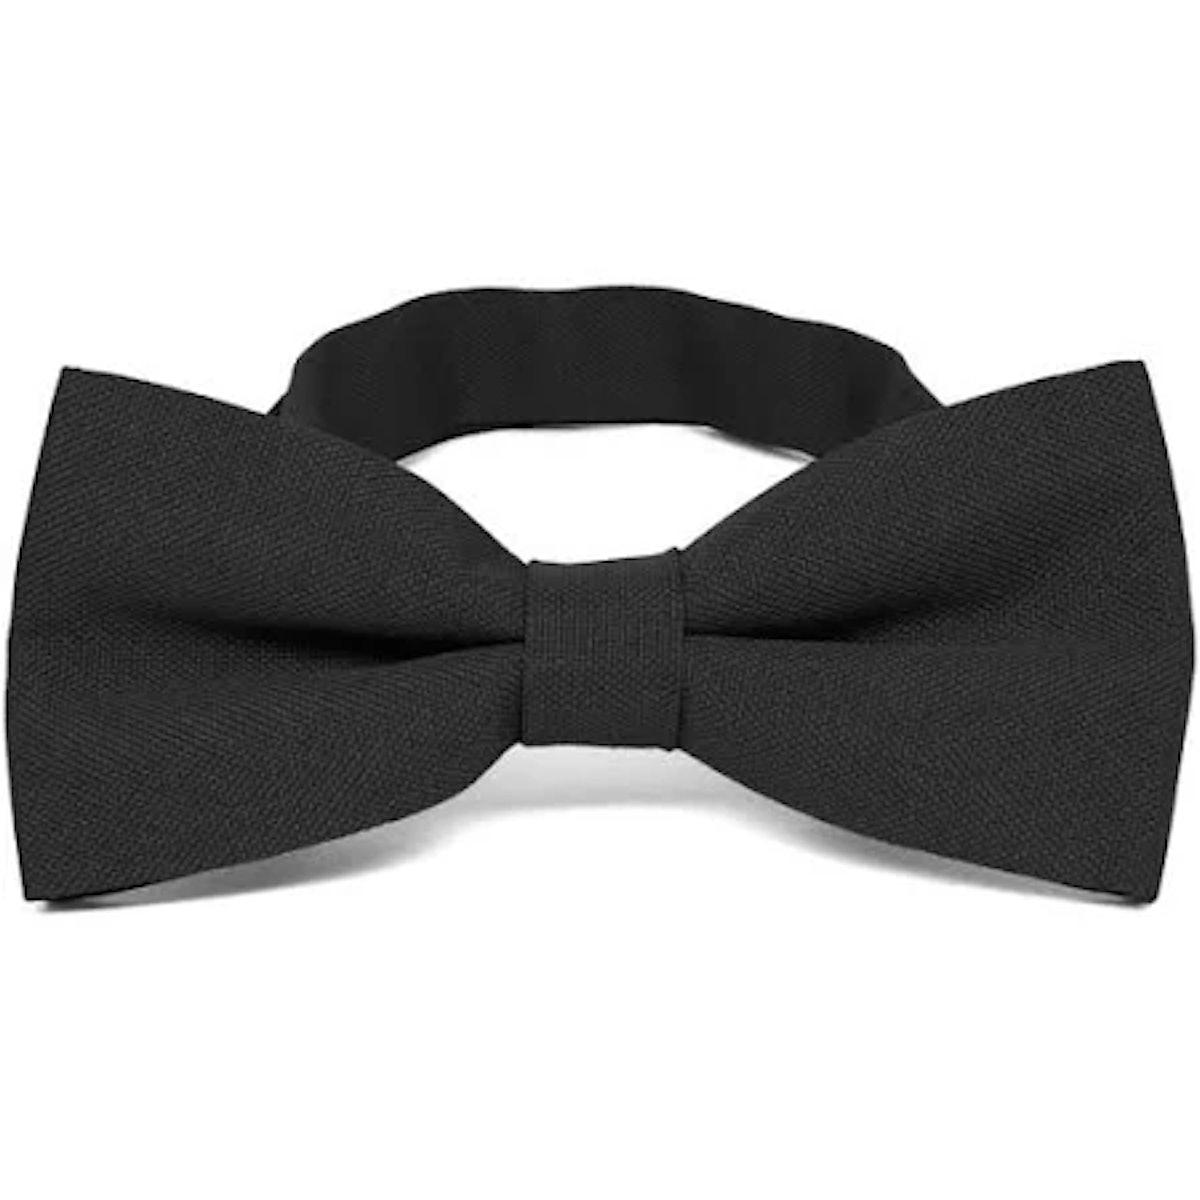 Black Matte Finish Bow Tie